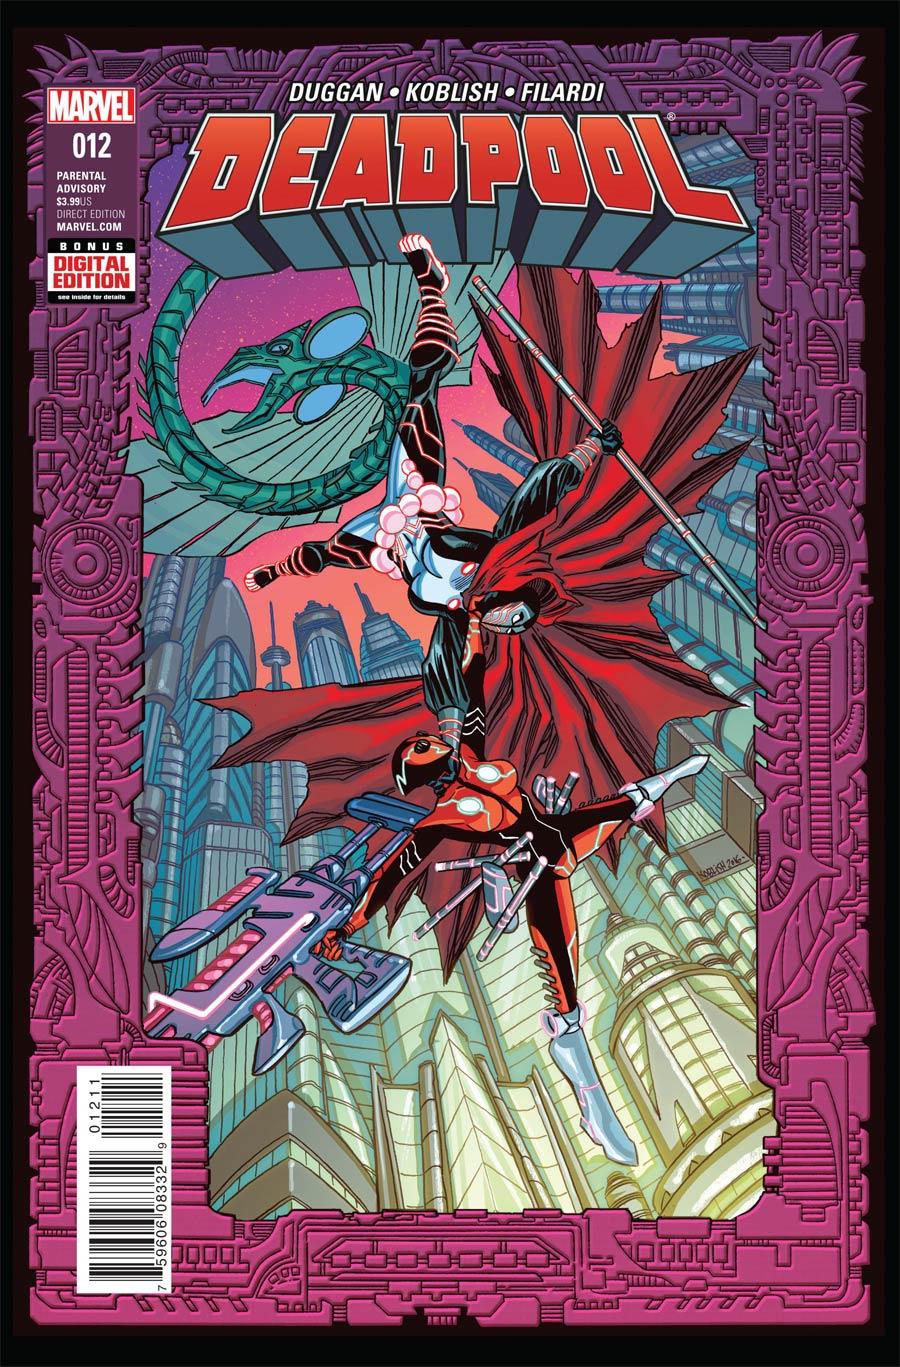 Deadpool Vol 5 #12 Cover A Regular Scott Koblish Cover